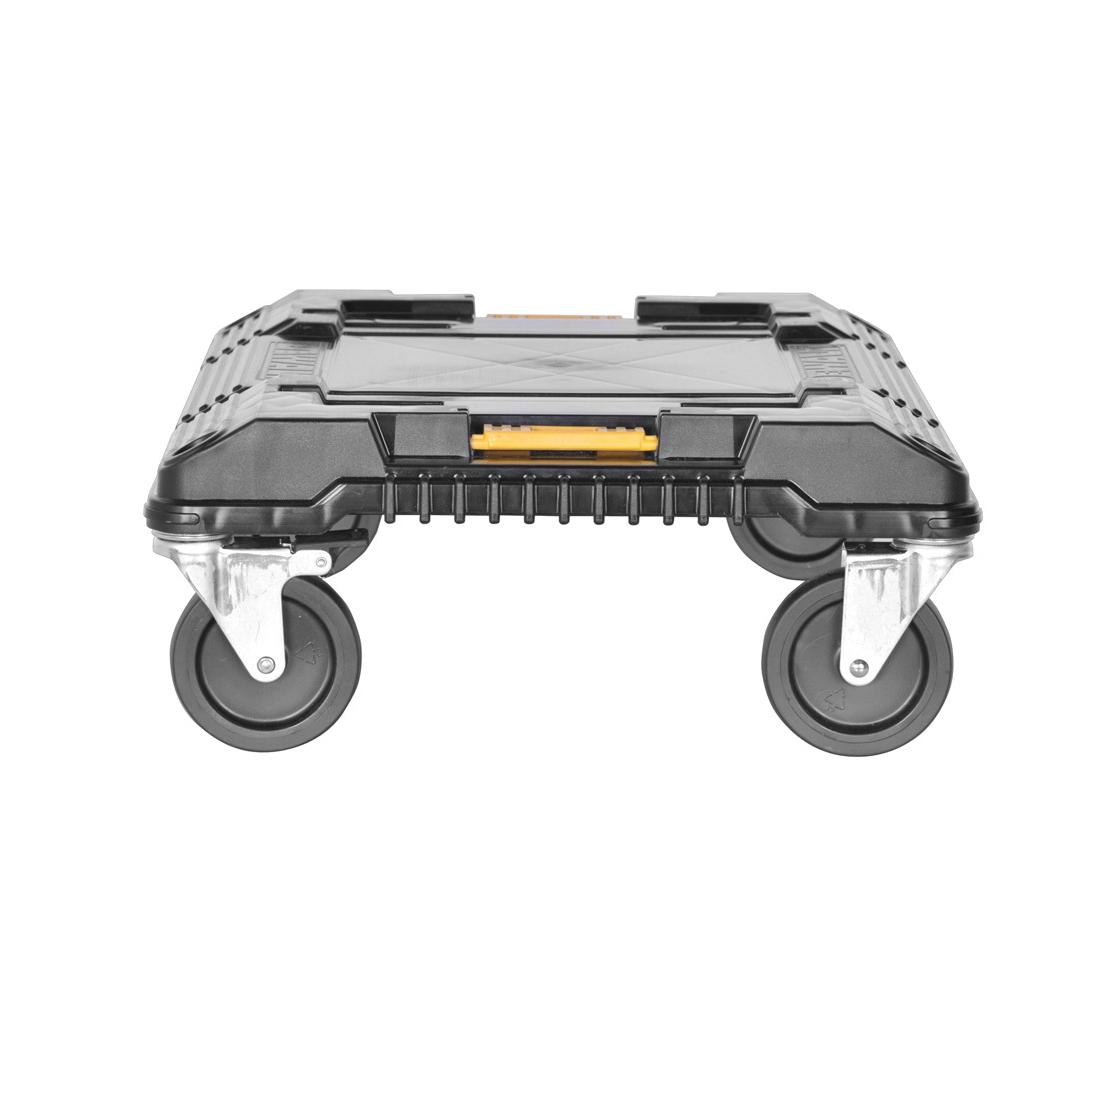 DeWALT® TSTAK® DWST17889 Tool Cart, For Use With TSTAK® Tool Storage System, 220 lb Weight, Black